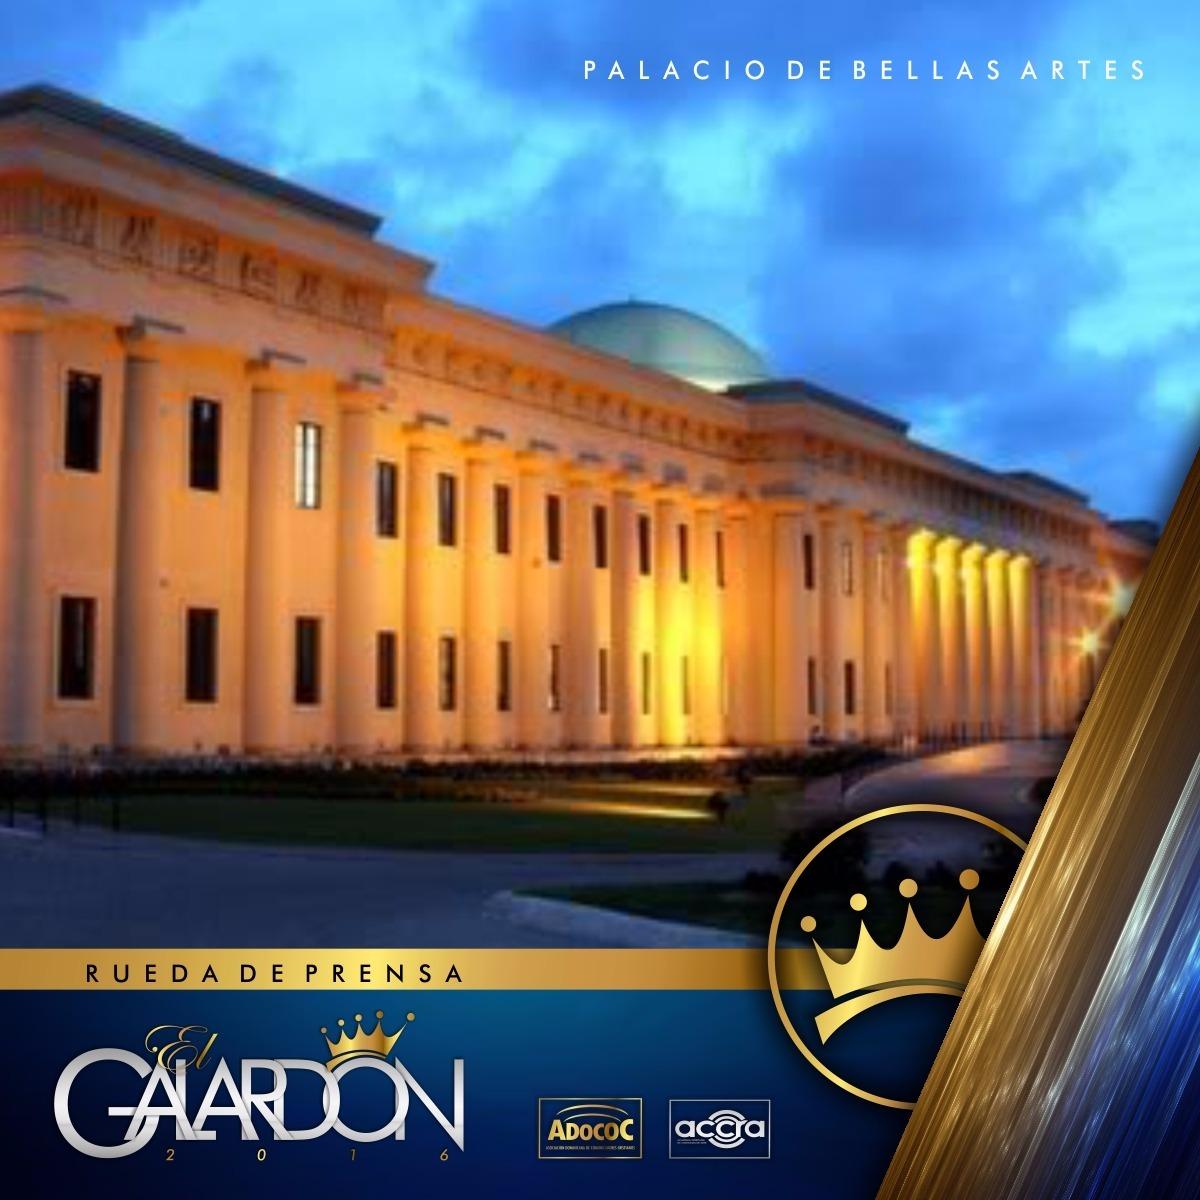 Premios Galardon2 (1)